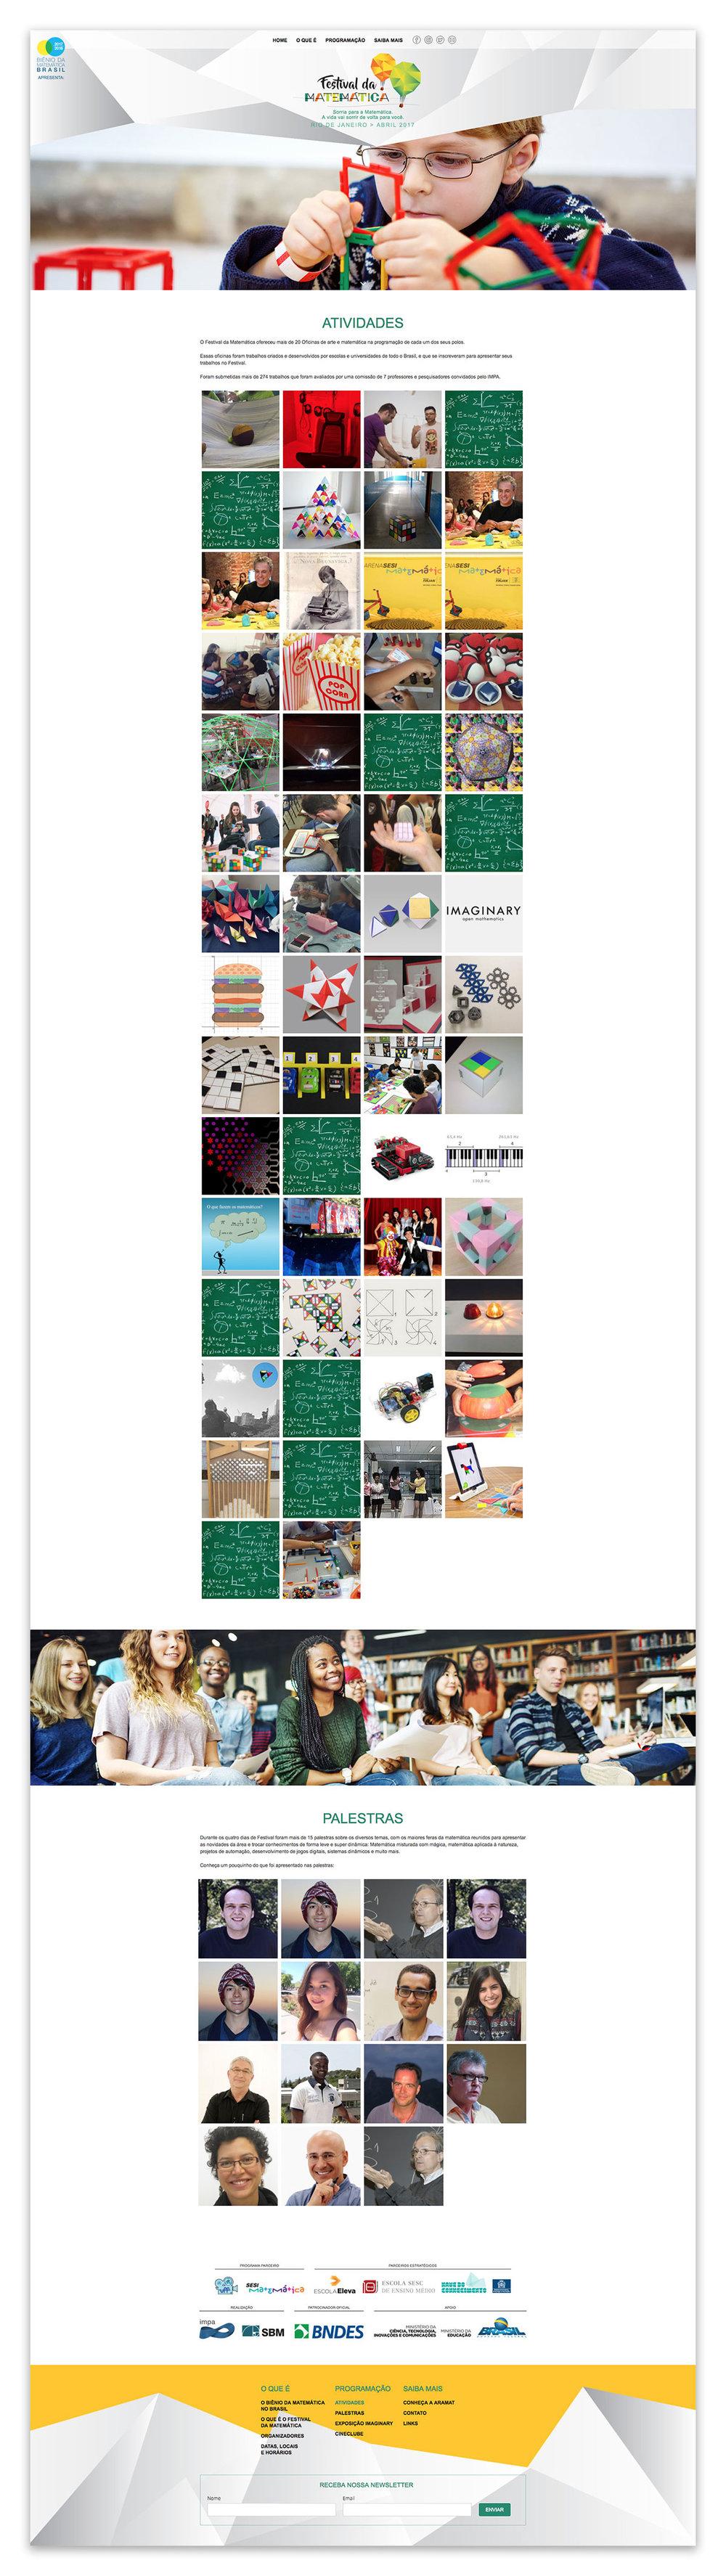 screencapture-festivaldamatematica-org-br-programacao-1518591902936.jpg